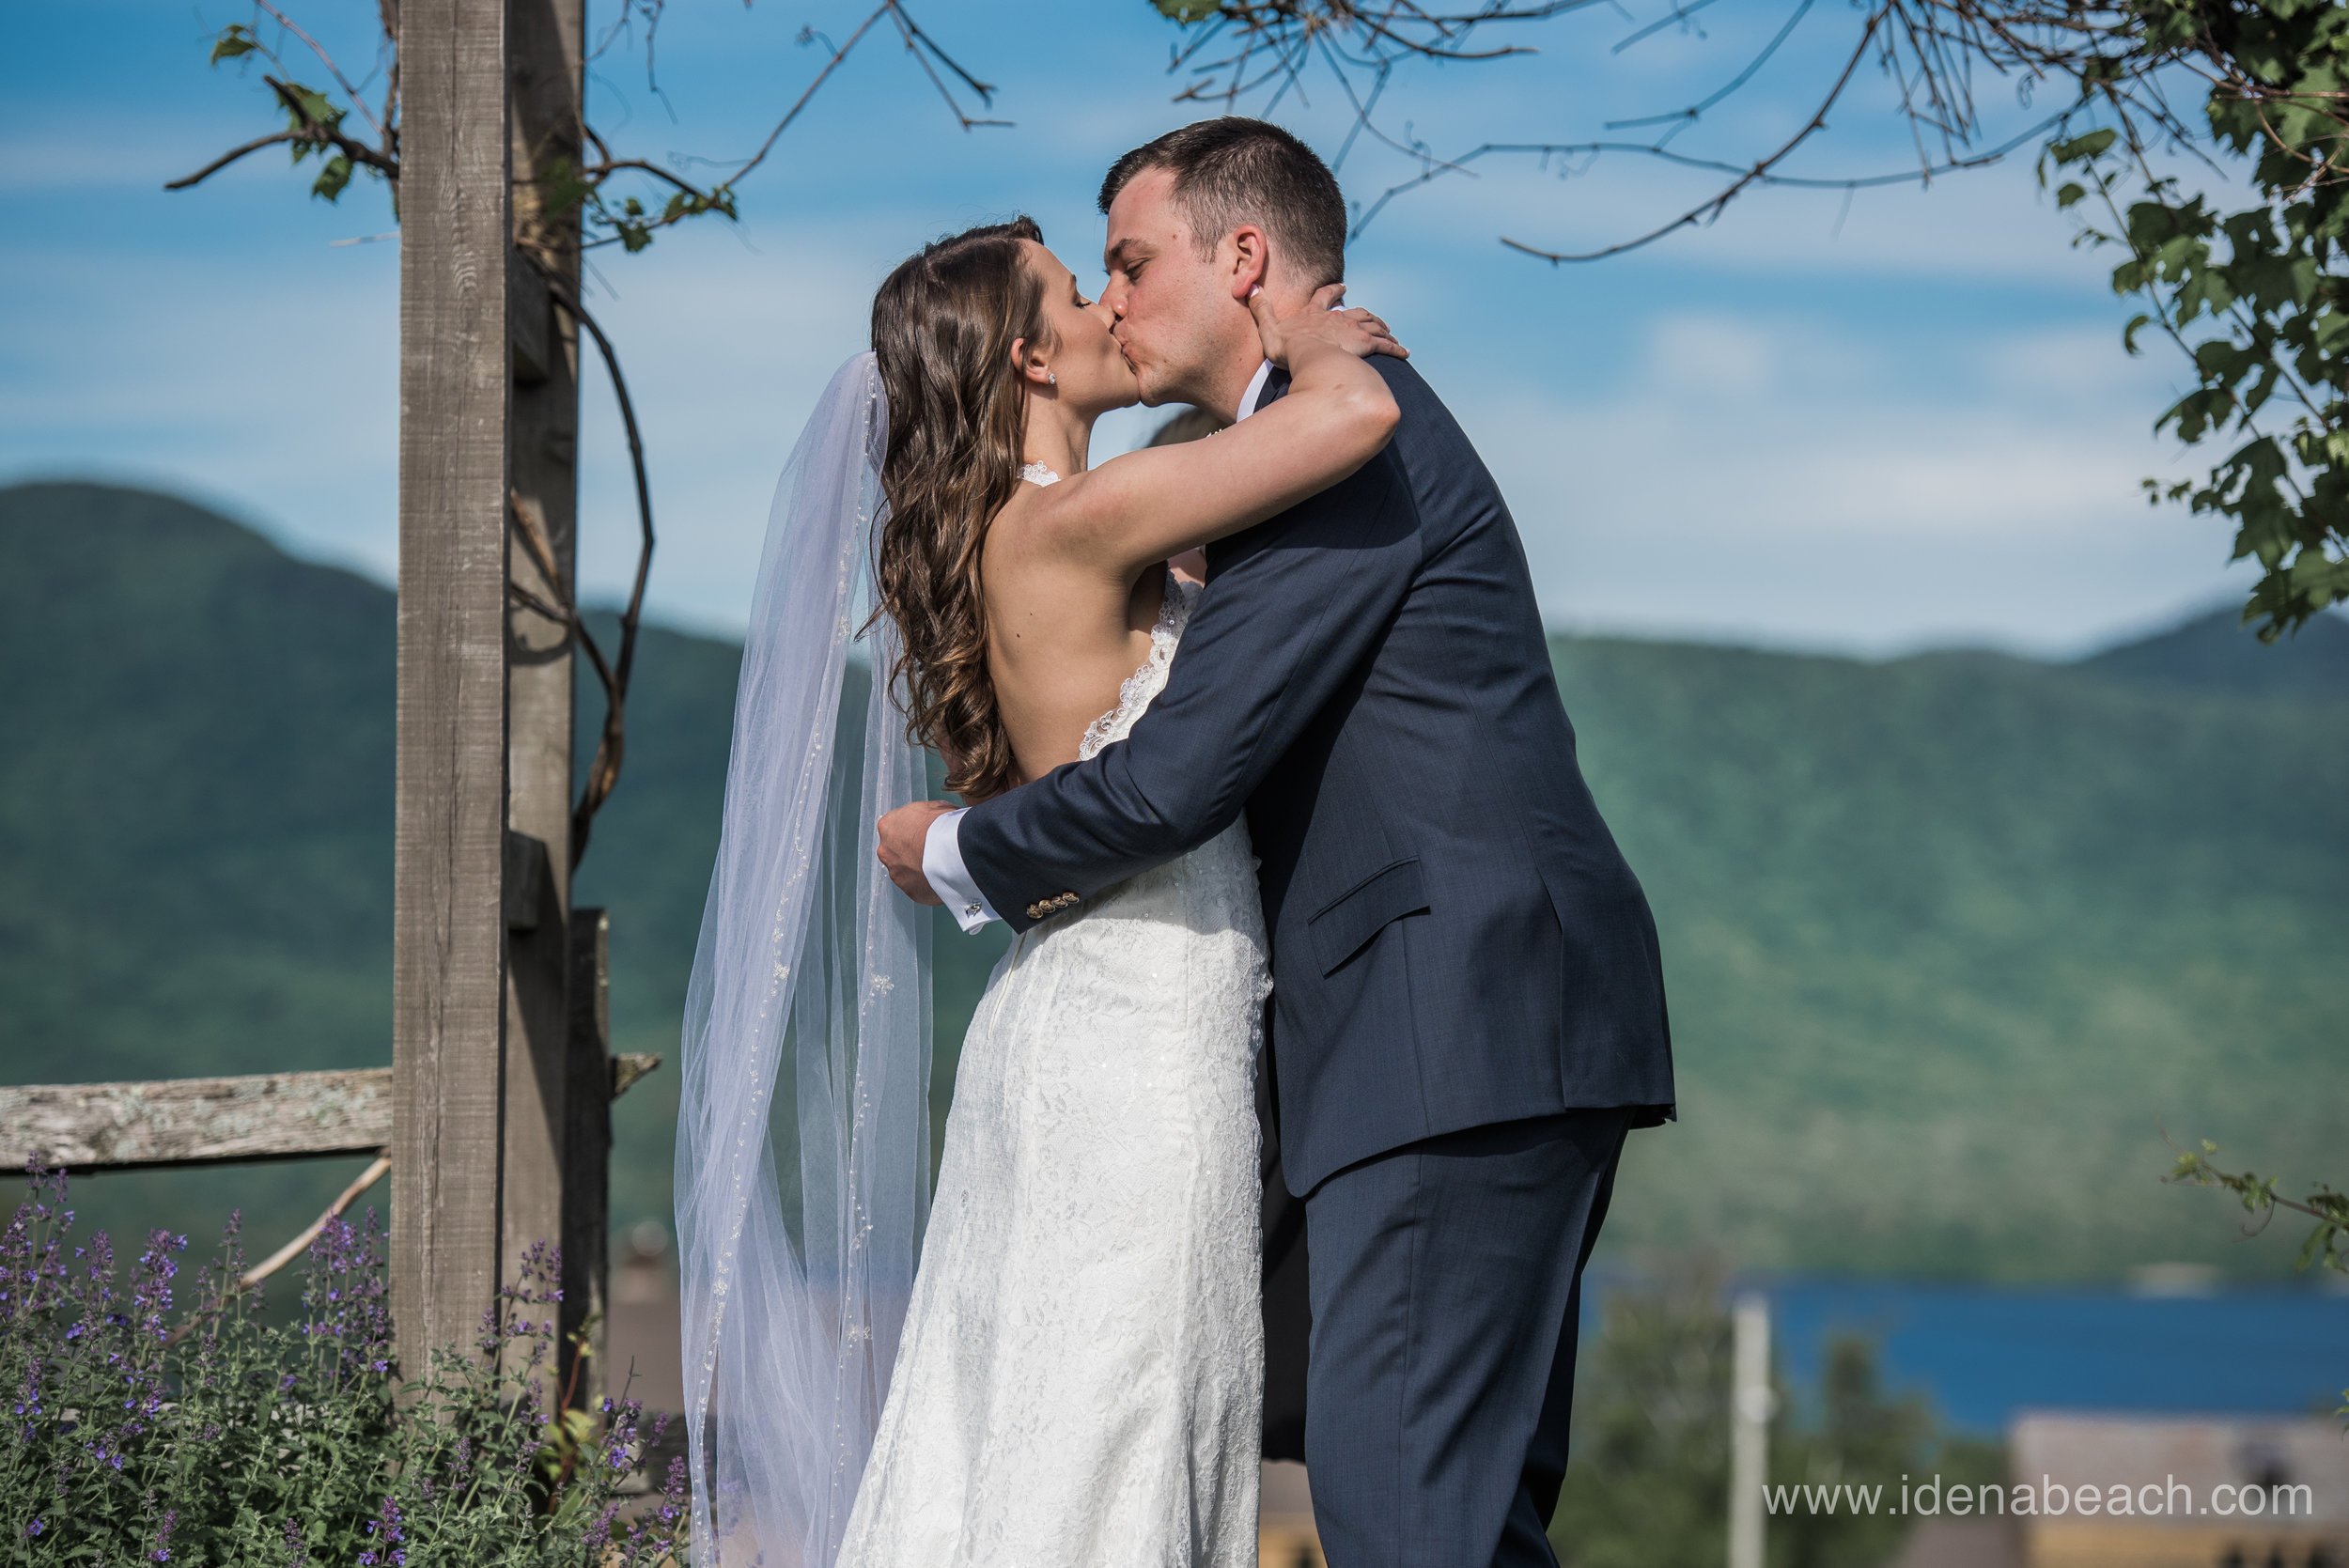 Mountain-Top-Inn-Vermont-Wedding-Photographer-64.jpg